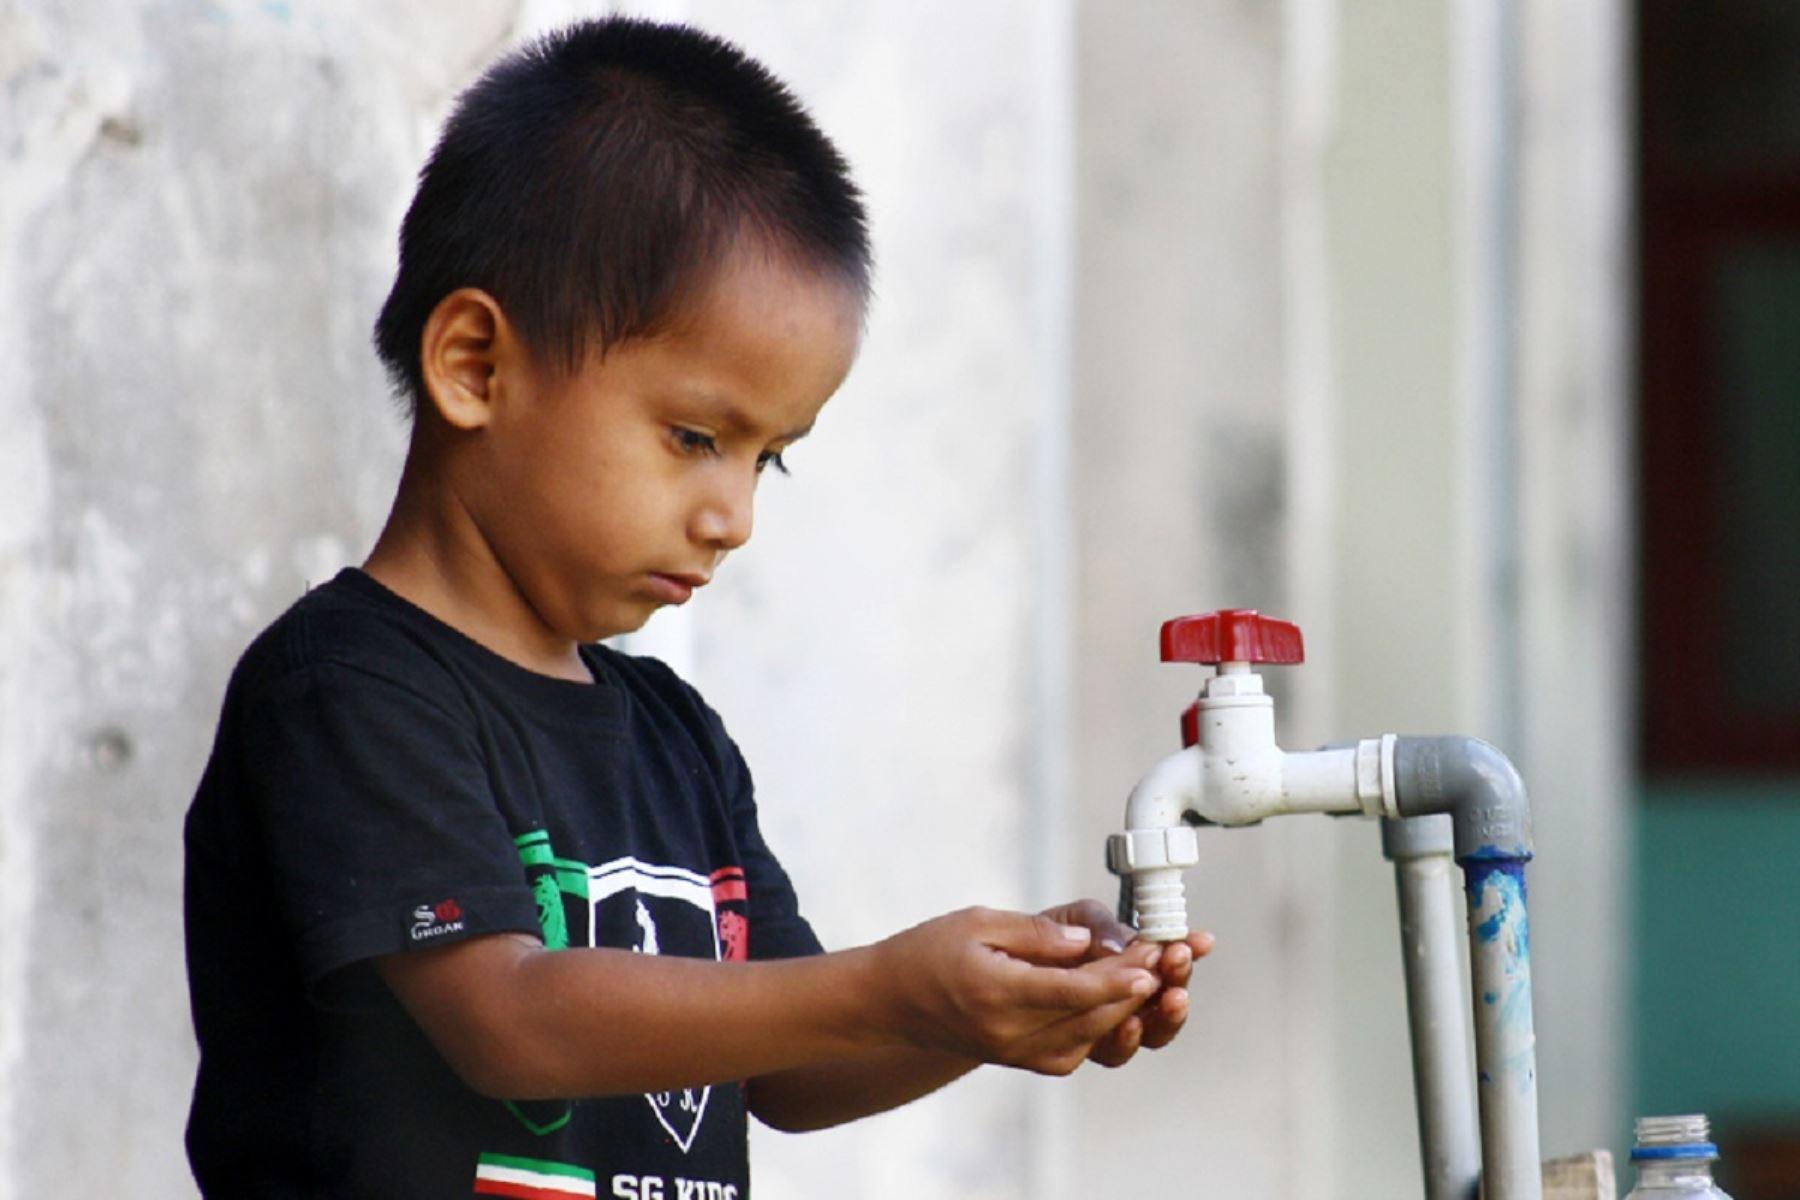 Fortalecerán regulación de servicios de saneamiento con recomendación OCDE